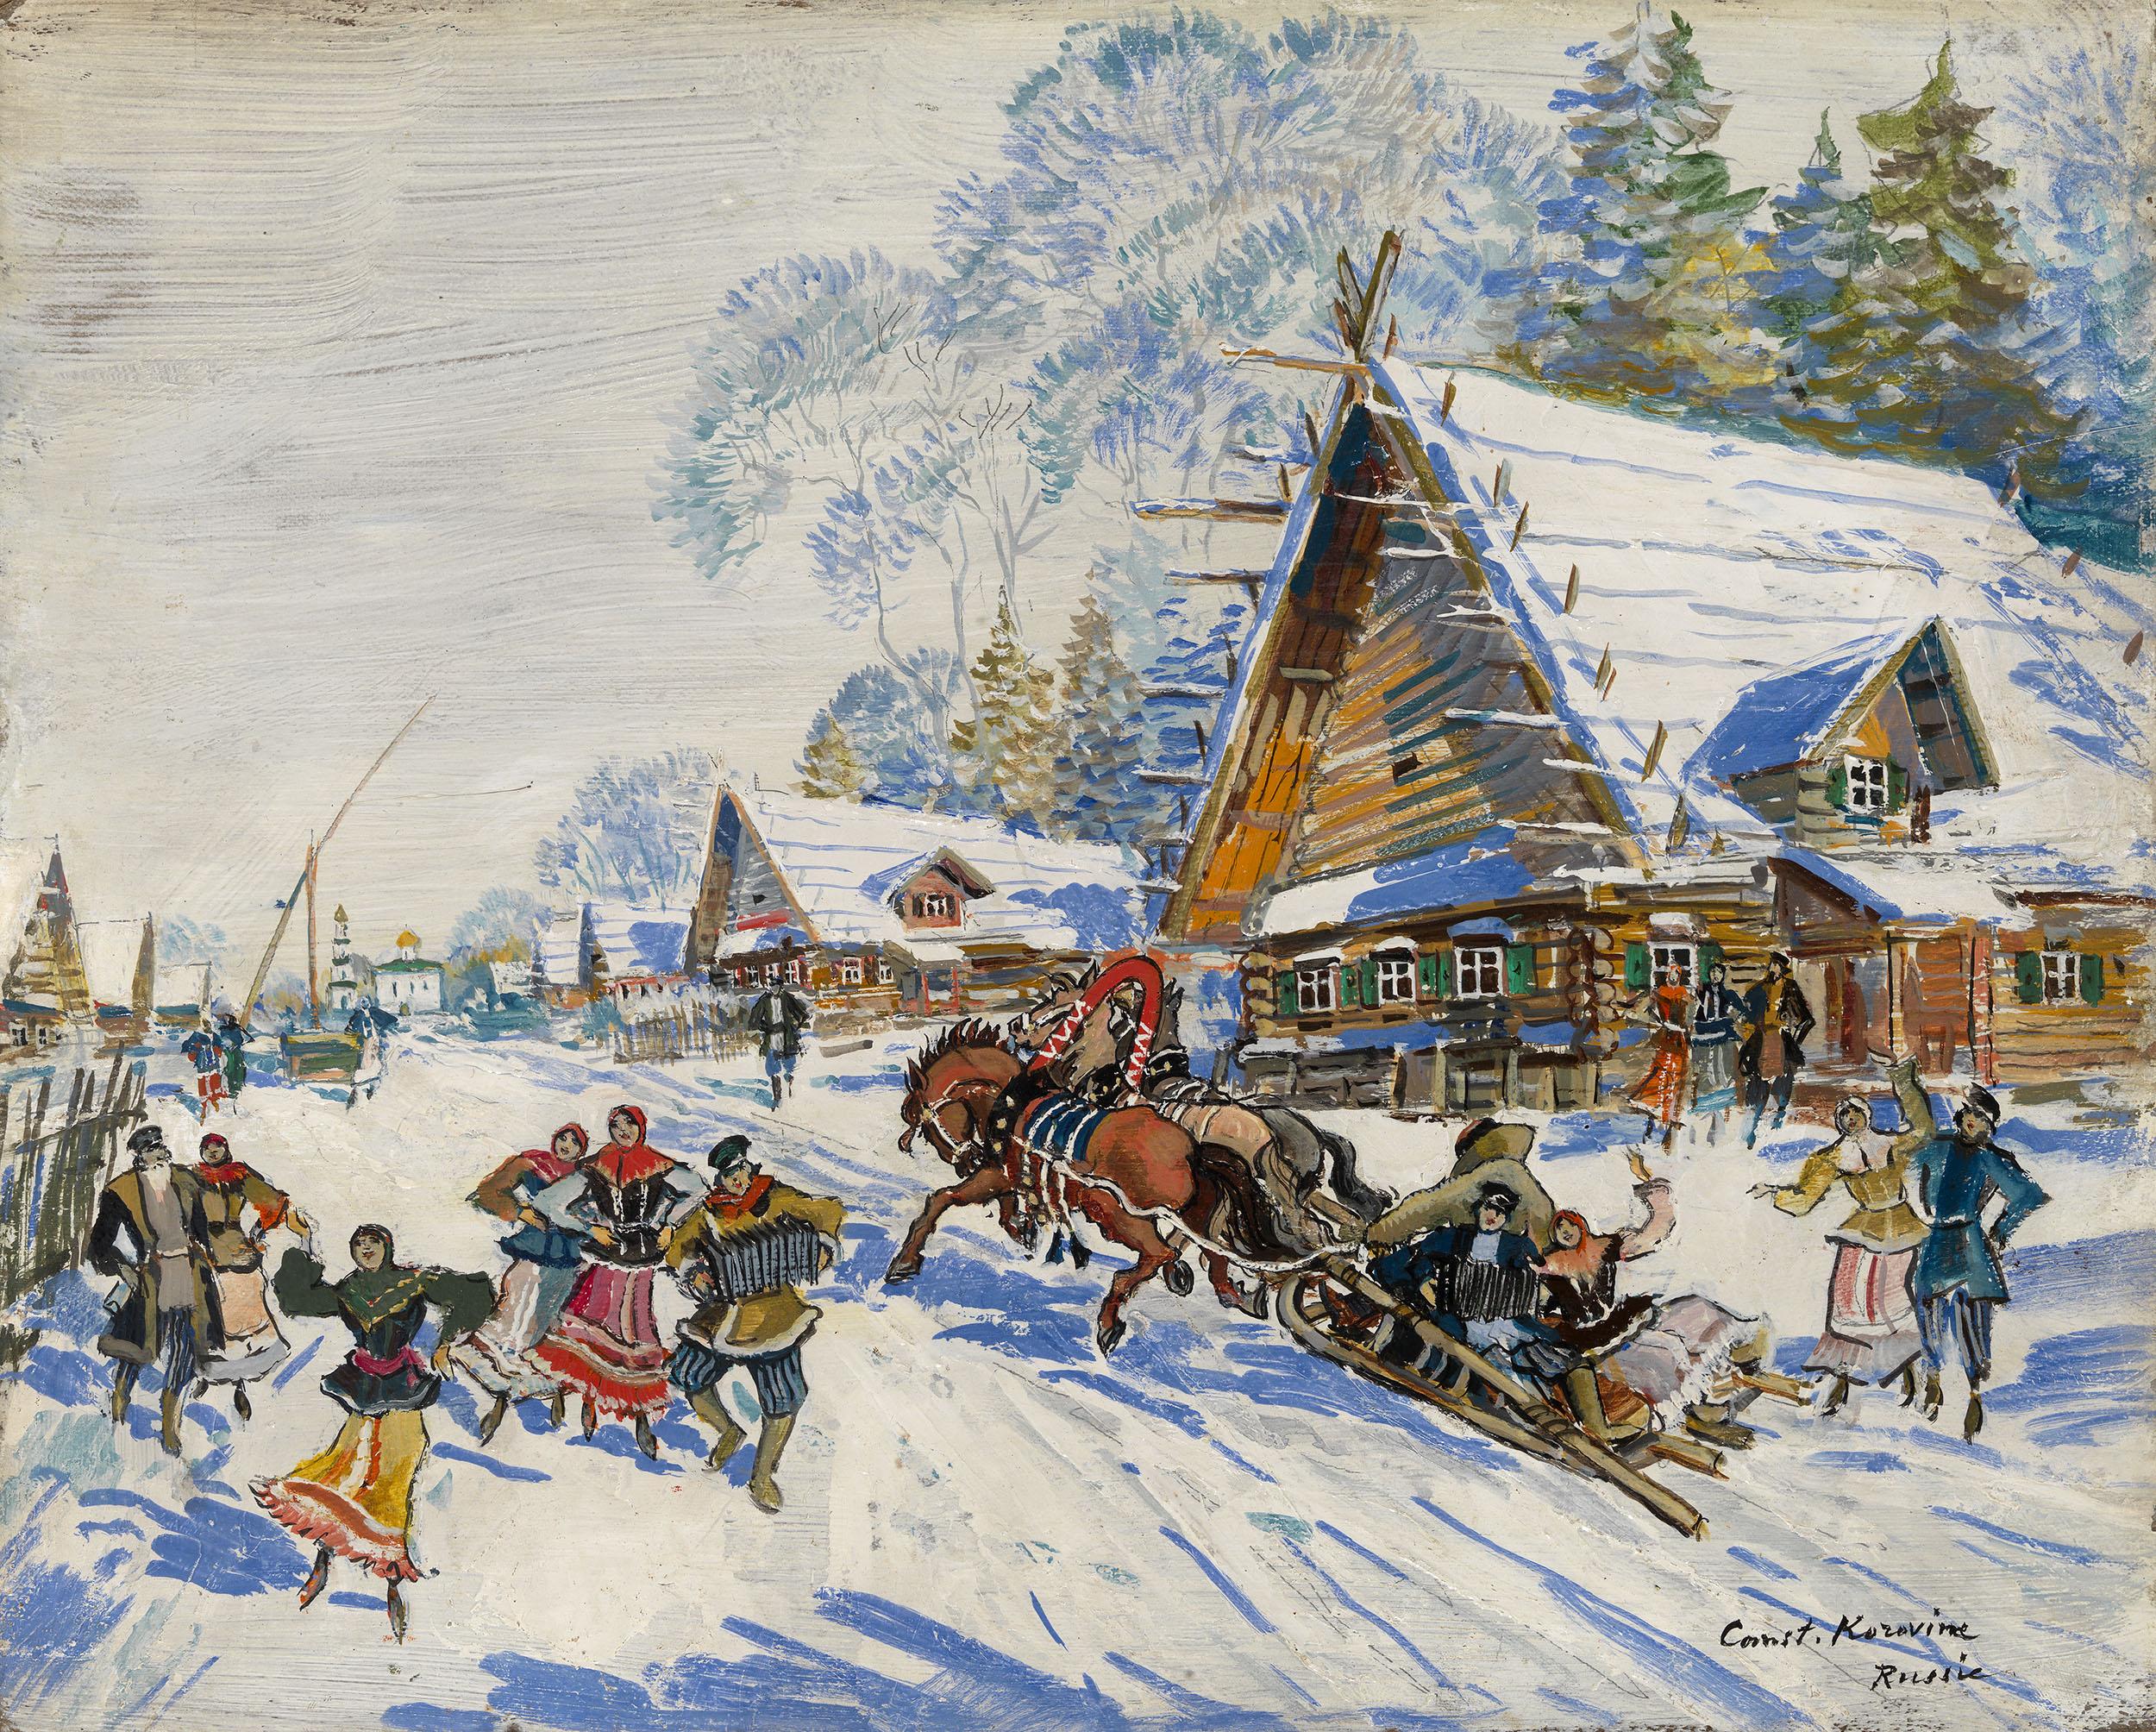 KOROVIN, KONSTANTIN Russian Village in Winter